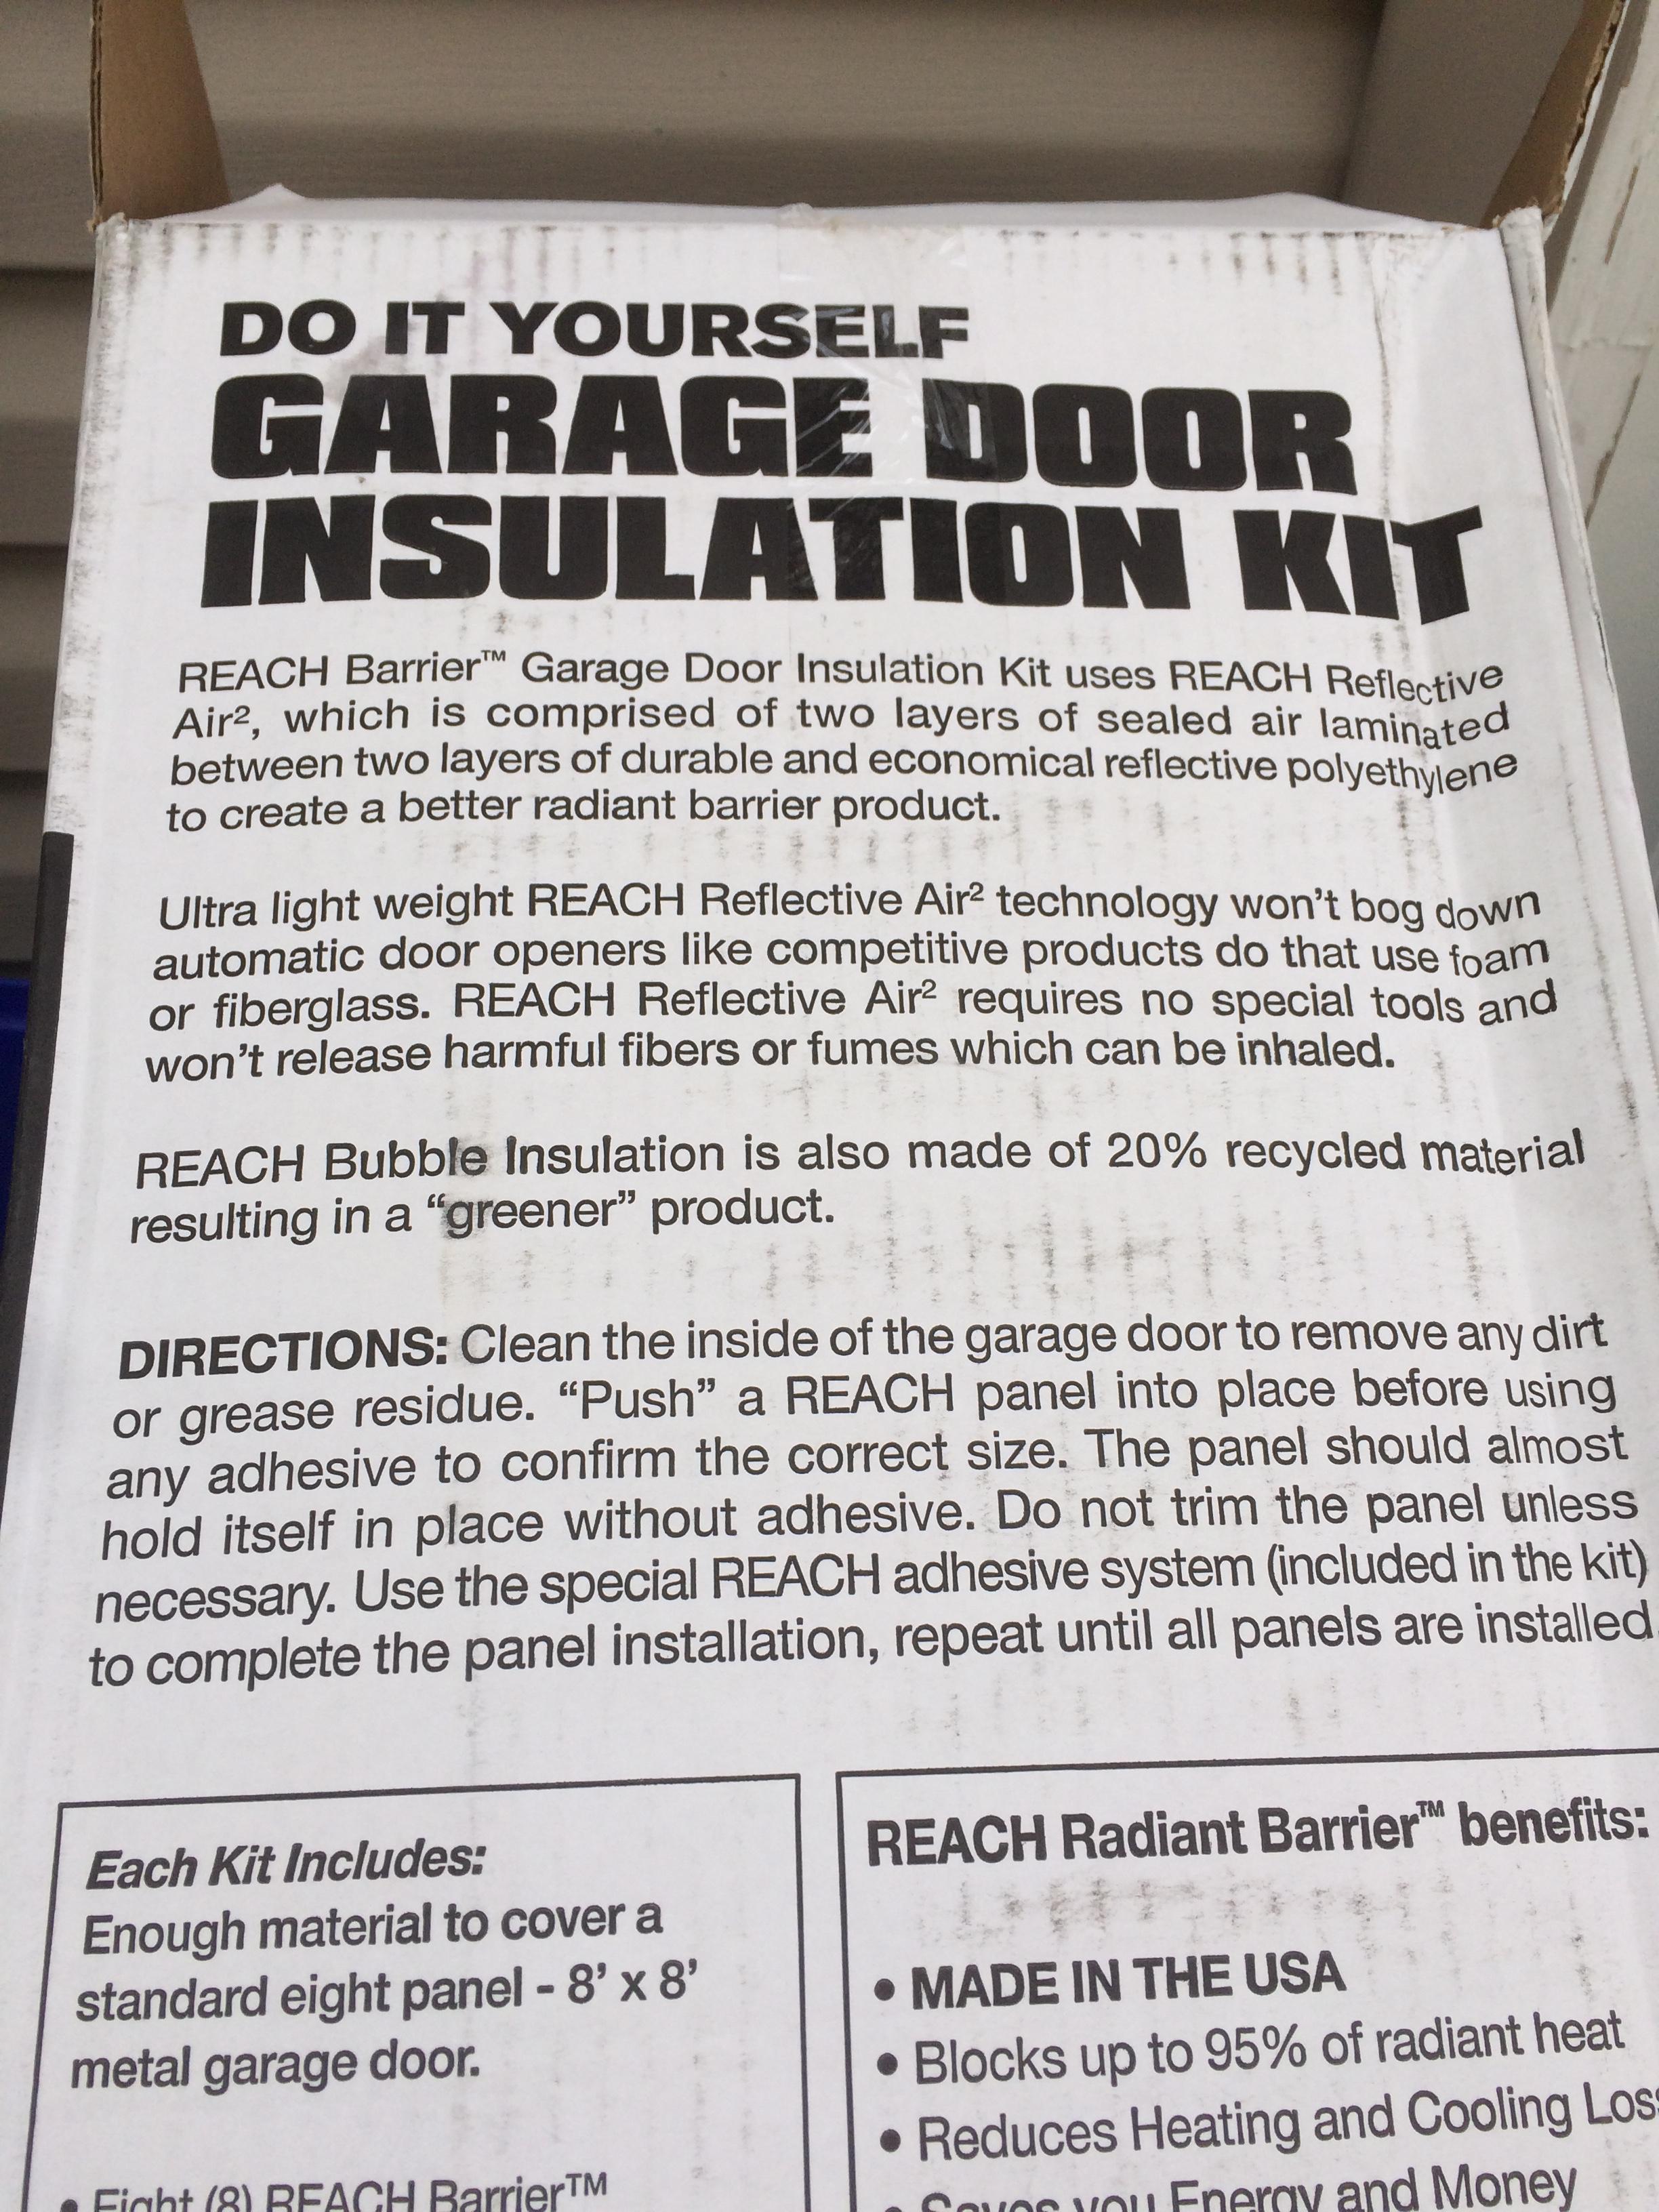 Insulating the garage door project sittin and wishin img4898 rubansaba